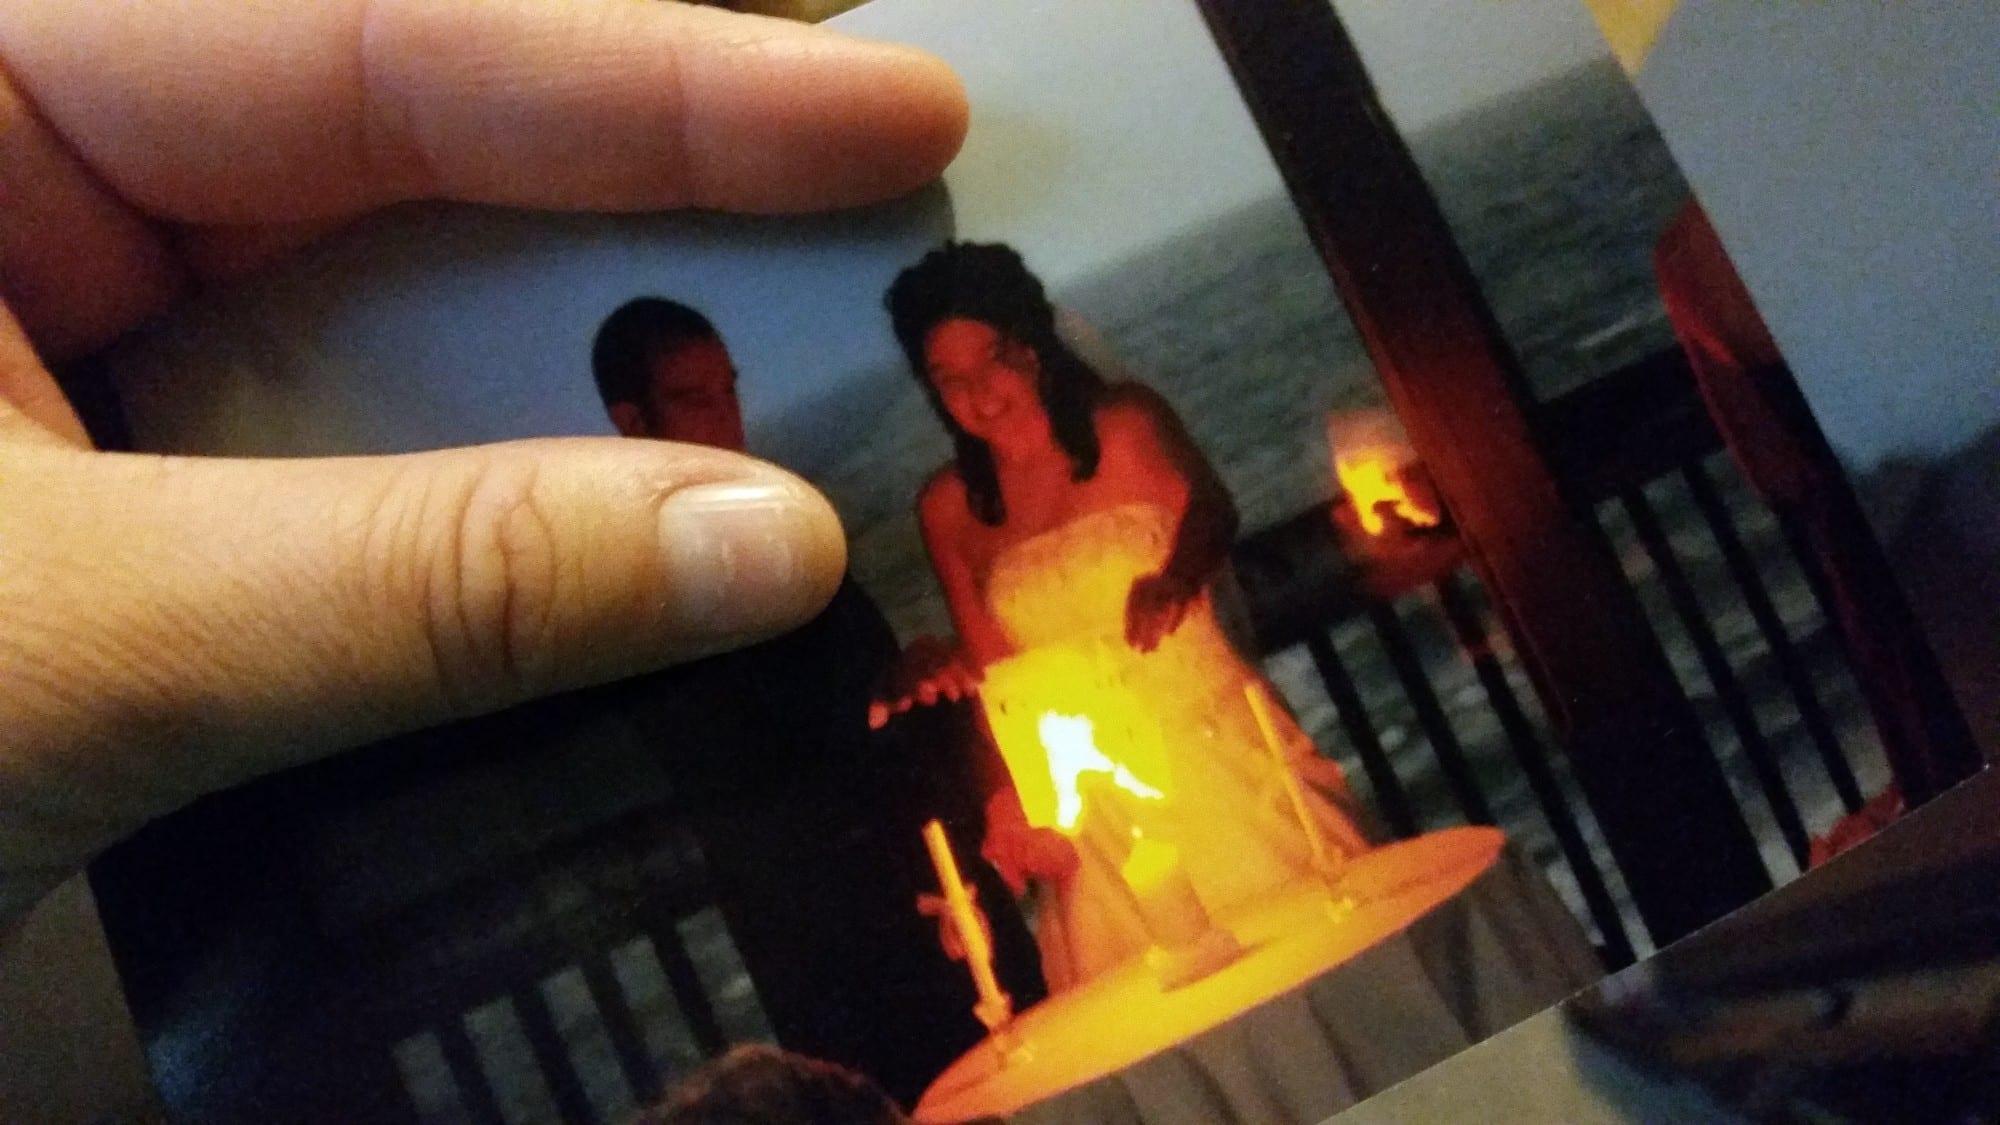 Flash Paper burning certificate of divorce